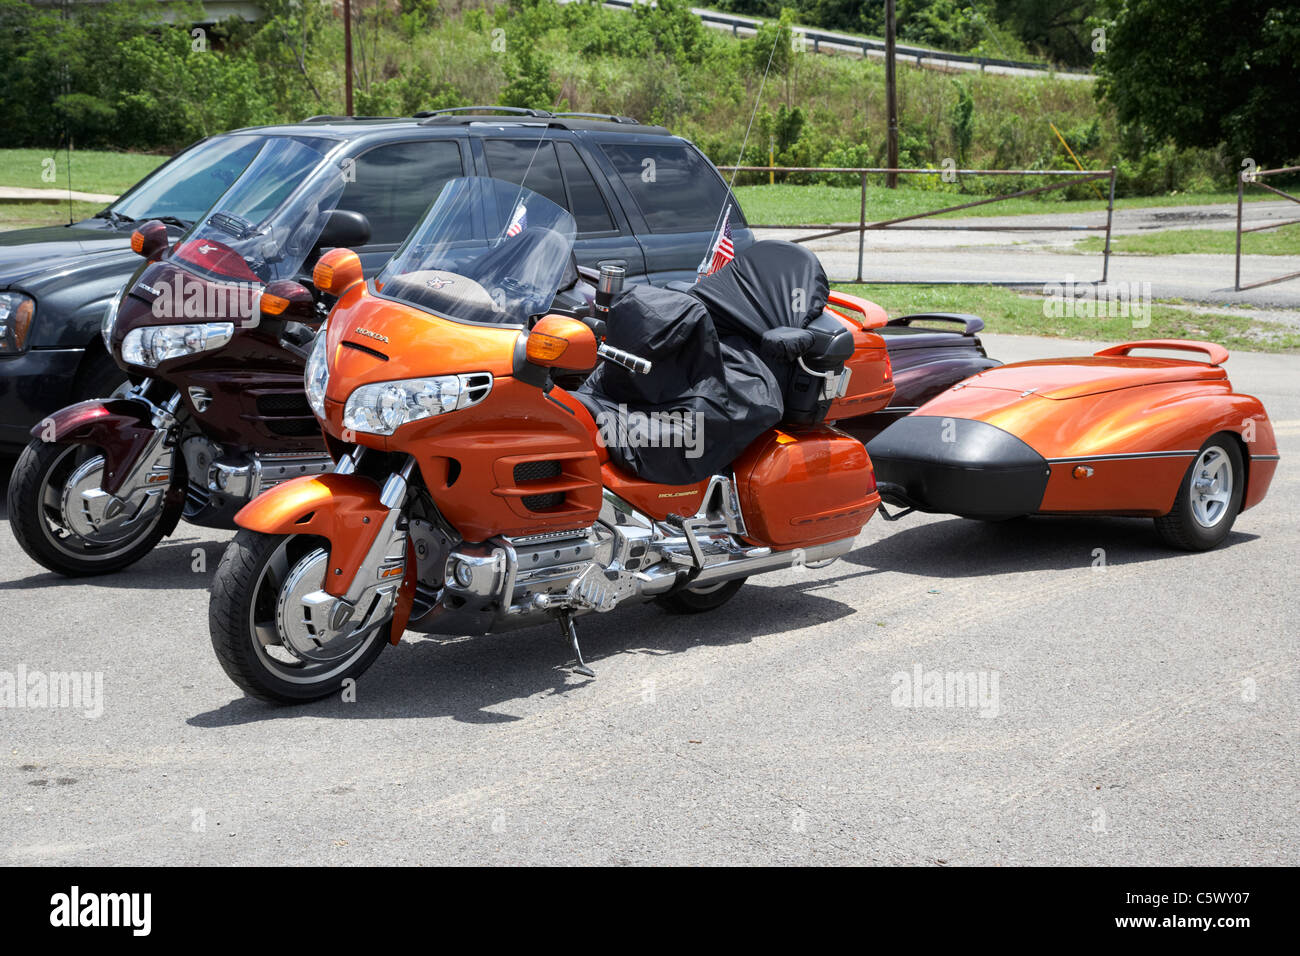 Honda Goldwing 2018 >> honda goldwing touring motorbikes with trailer Lynchburg , tennessee Stock Photo: 38063991 - Alamy